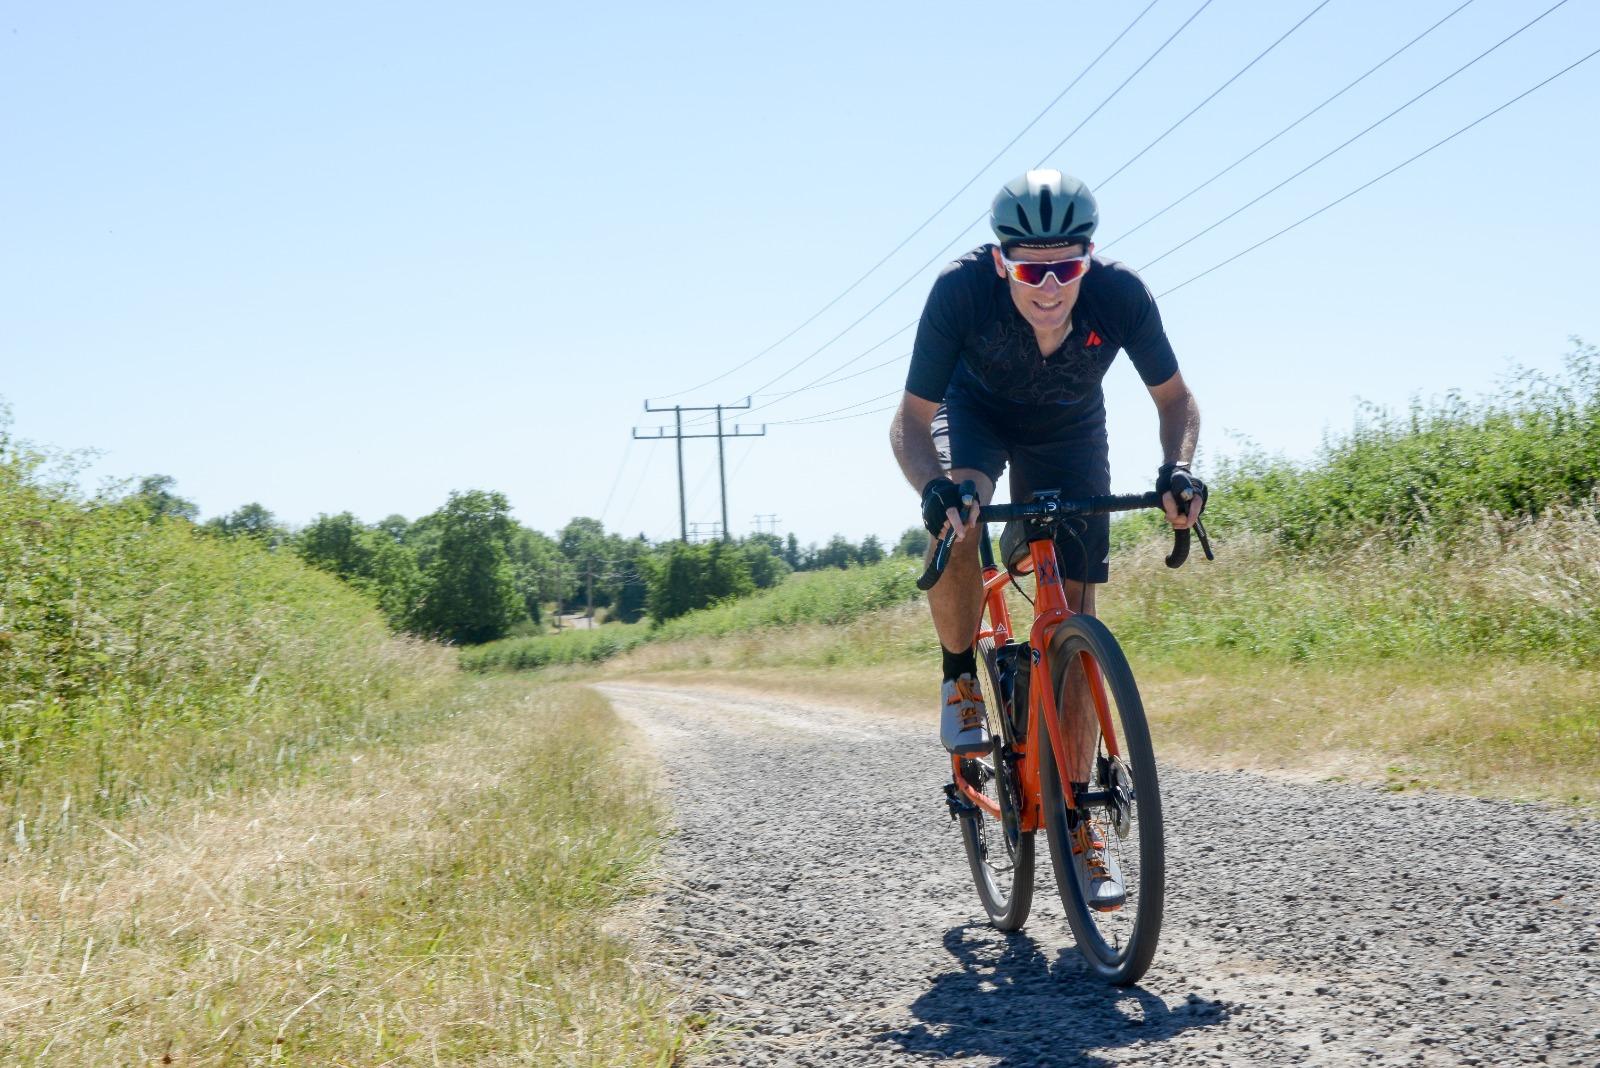 James Deane riding his gravel bike